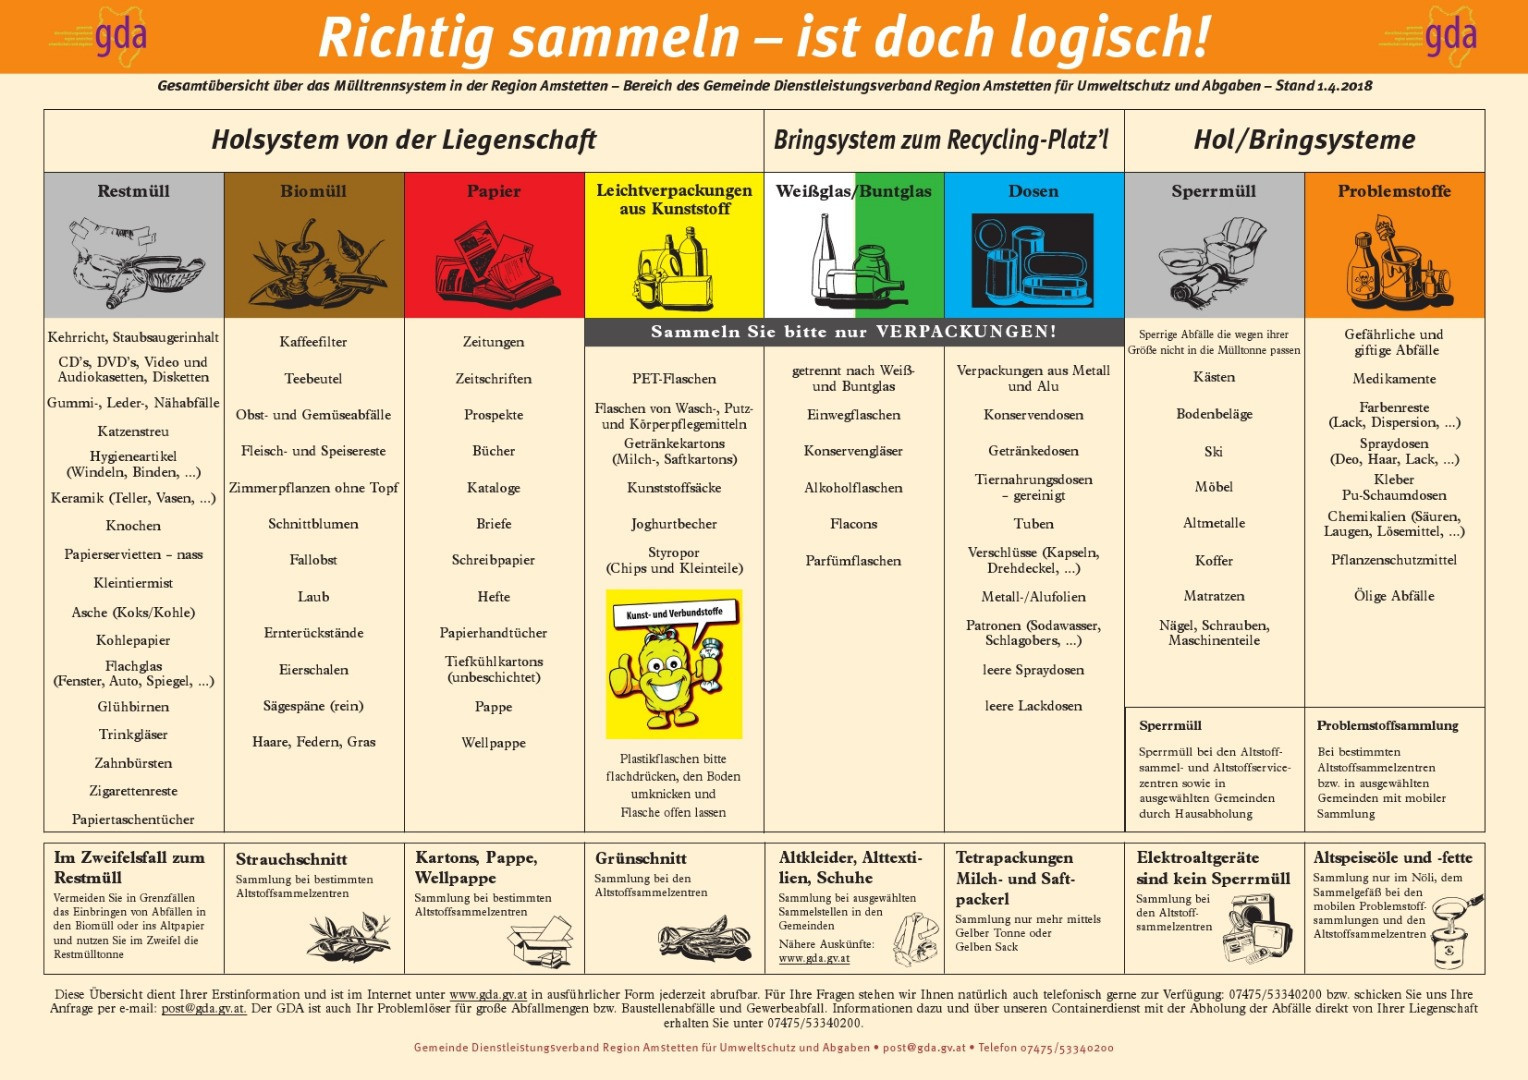 GDA_Infoblatt Richtig Sammeln 2018.jpg